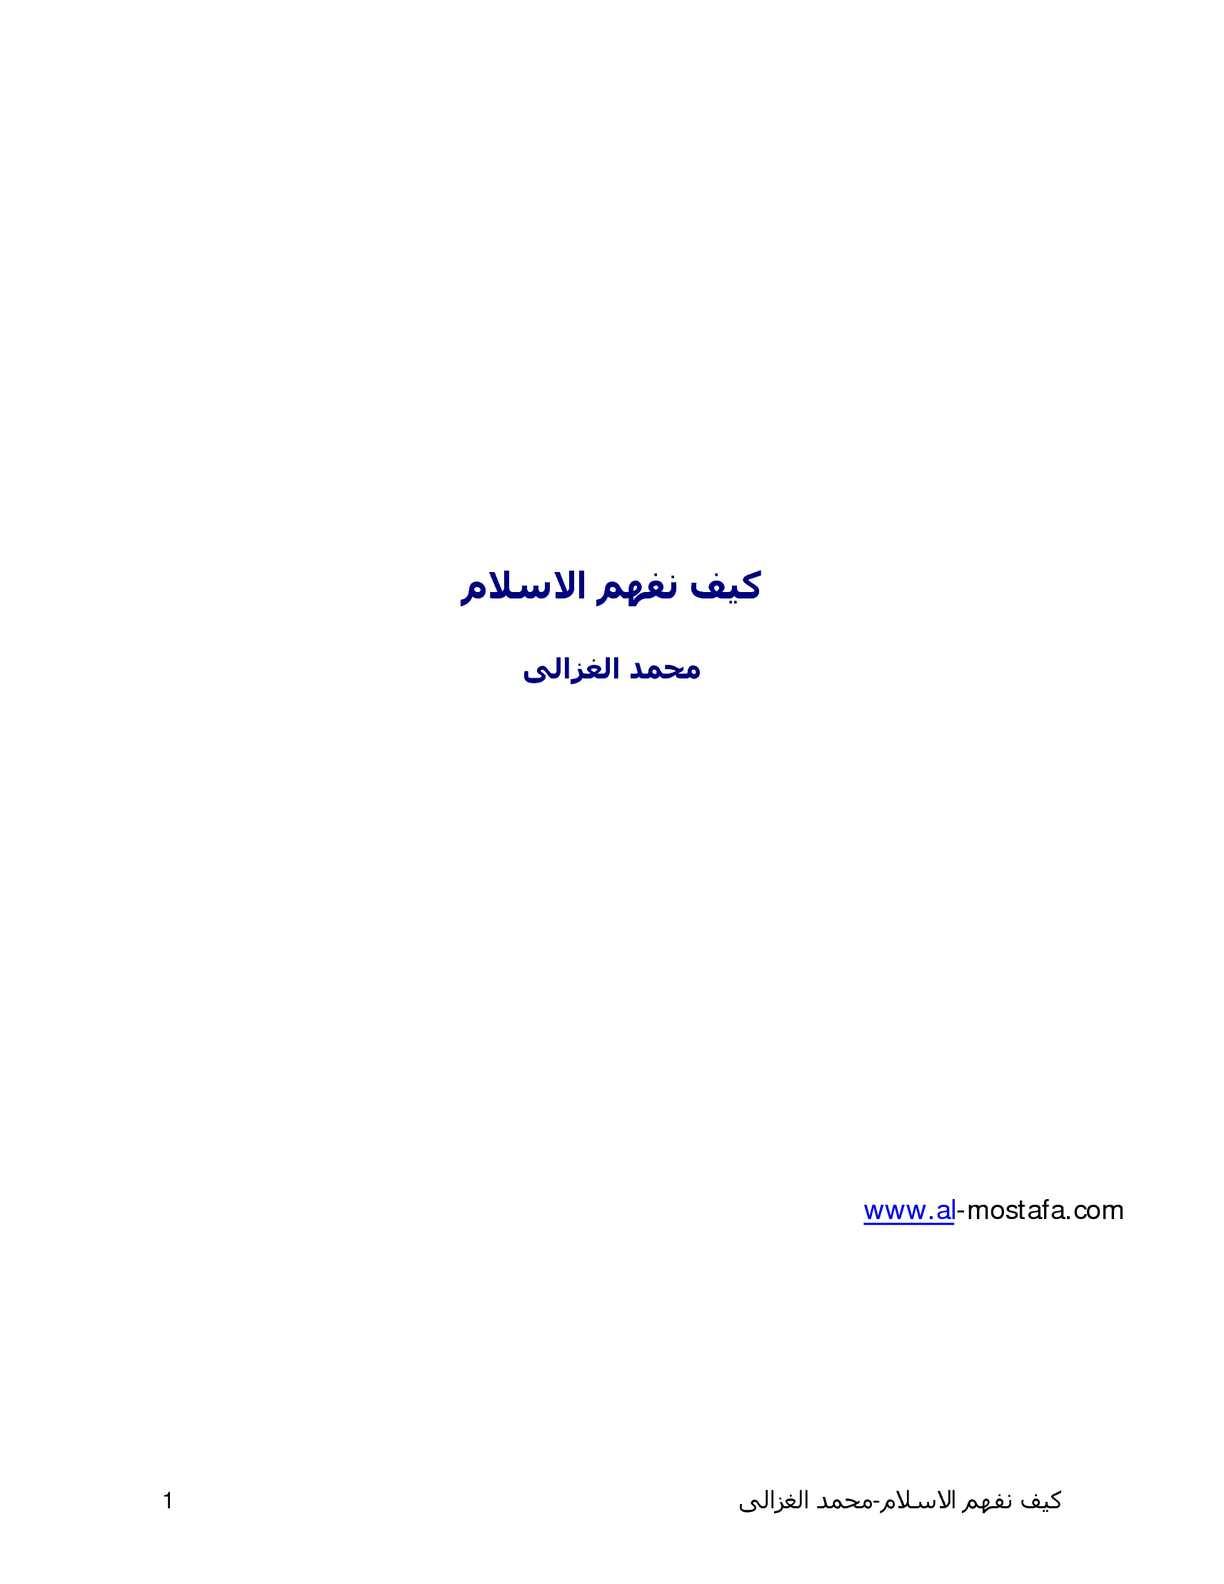 b2571671f Calaméo - Comment comprendre l'ISLAM - كيف نفهم الاسلام